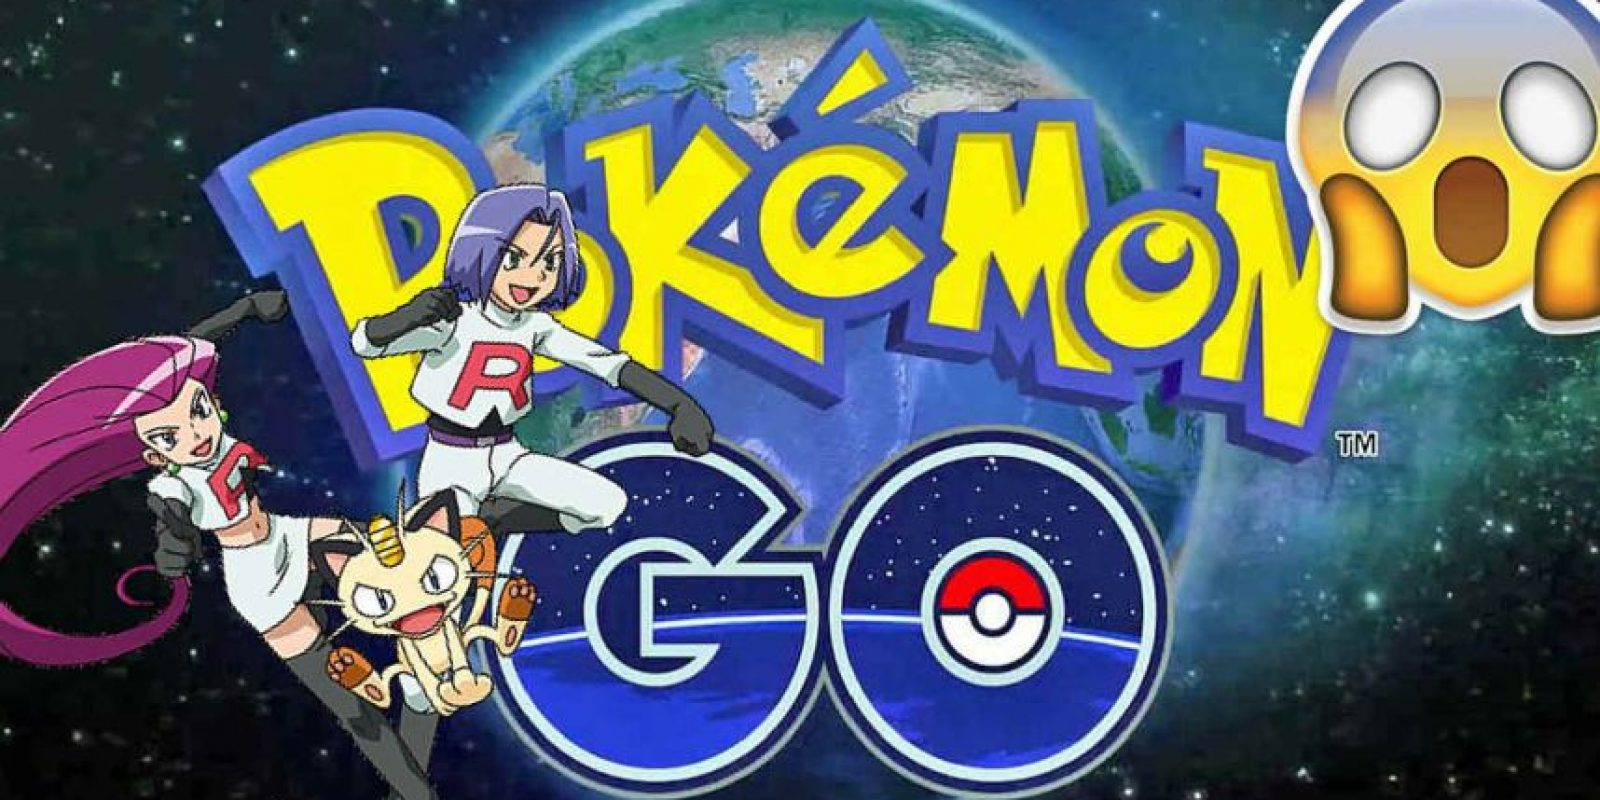 Pokémon Go es un popular juego para celulares. Foto:Pokémon Go. Imagen Por: